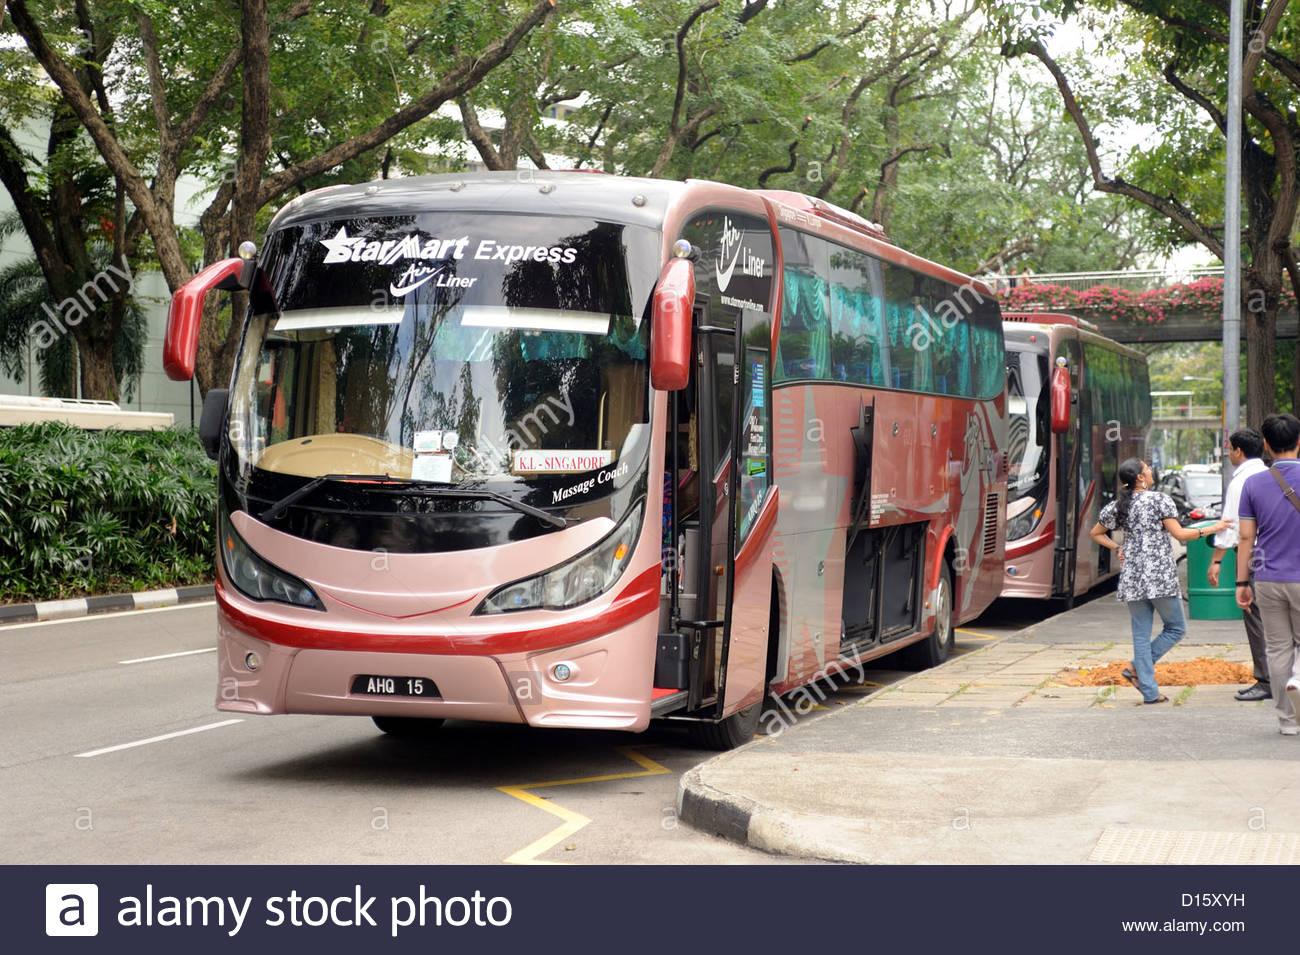 Singapur - Fuera de Golden Mile tower, autobuses a Kuala Lumpur, aquí operado por Starmart express. Imagen De Stock